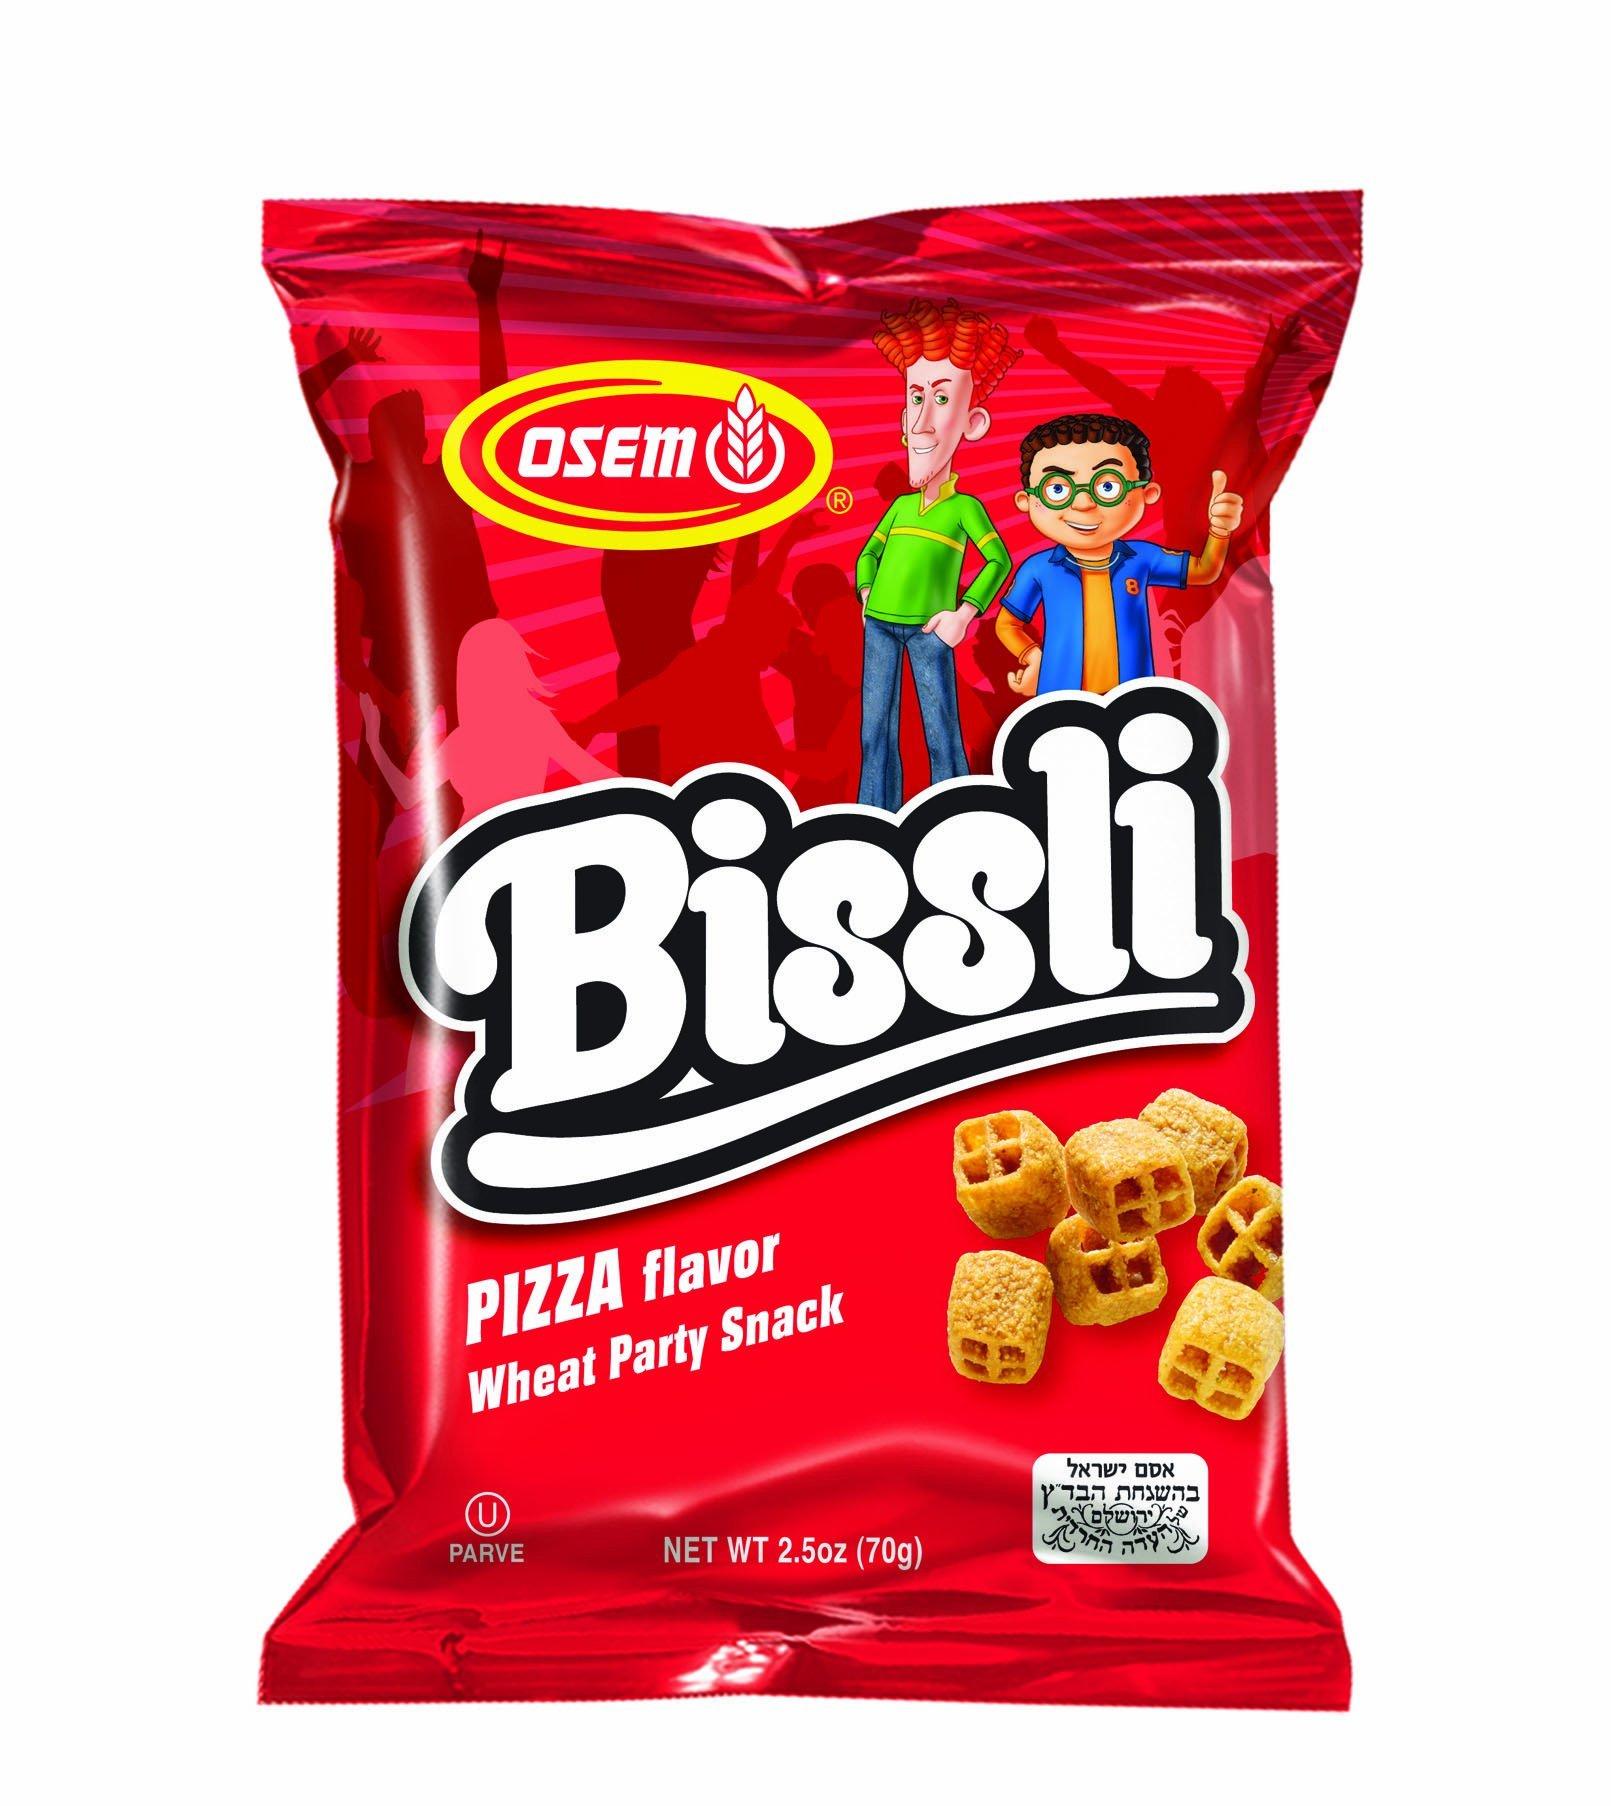 Bissli Pizza Flavored Crunchy Wheat Snack - No Food Coloring or Preservatives, 2.5oz Bag (Pack of 6)